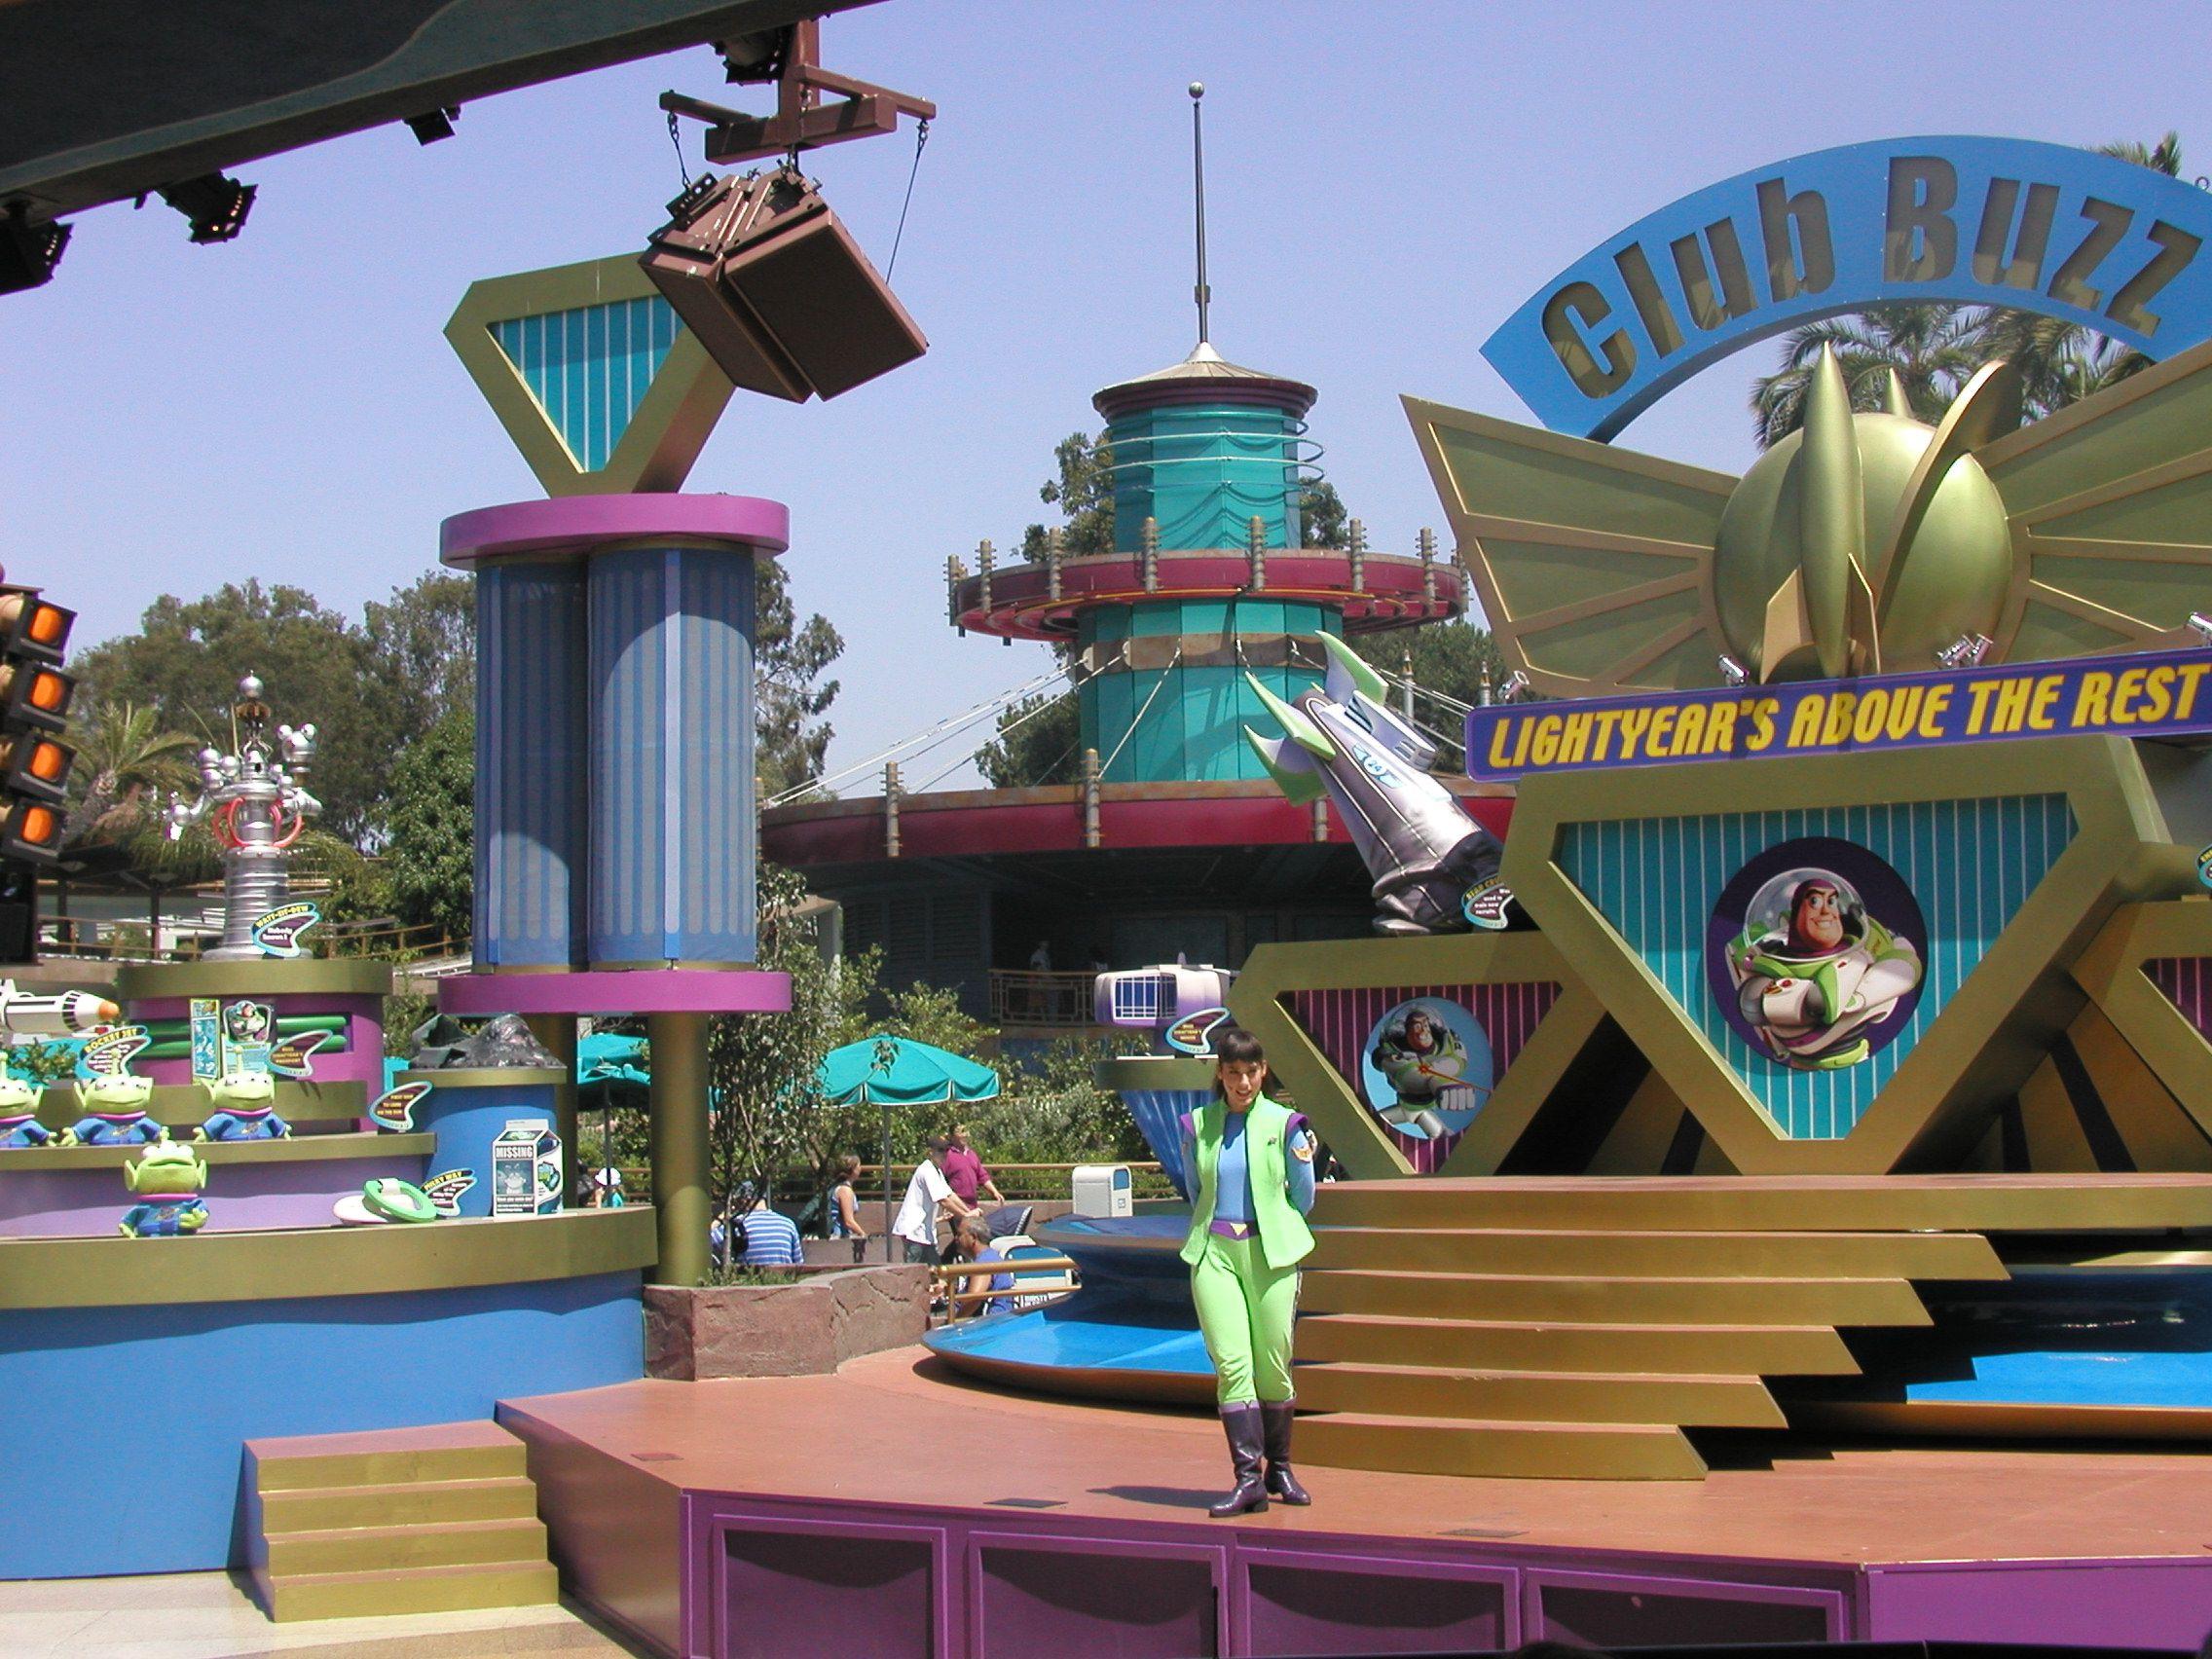 Club Buzz In Disneyland S Tomorrowland Closed